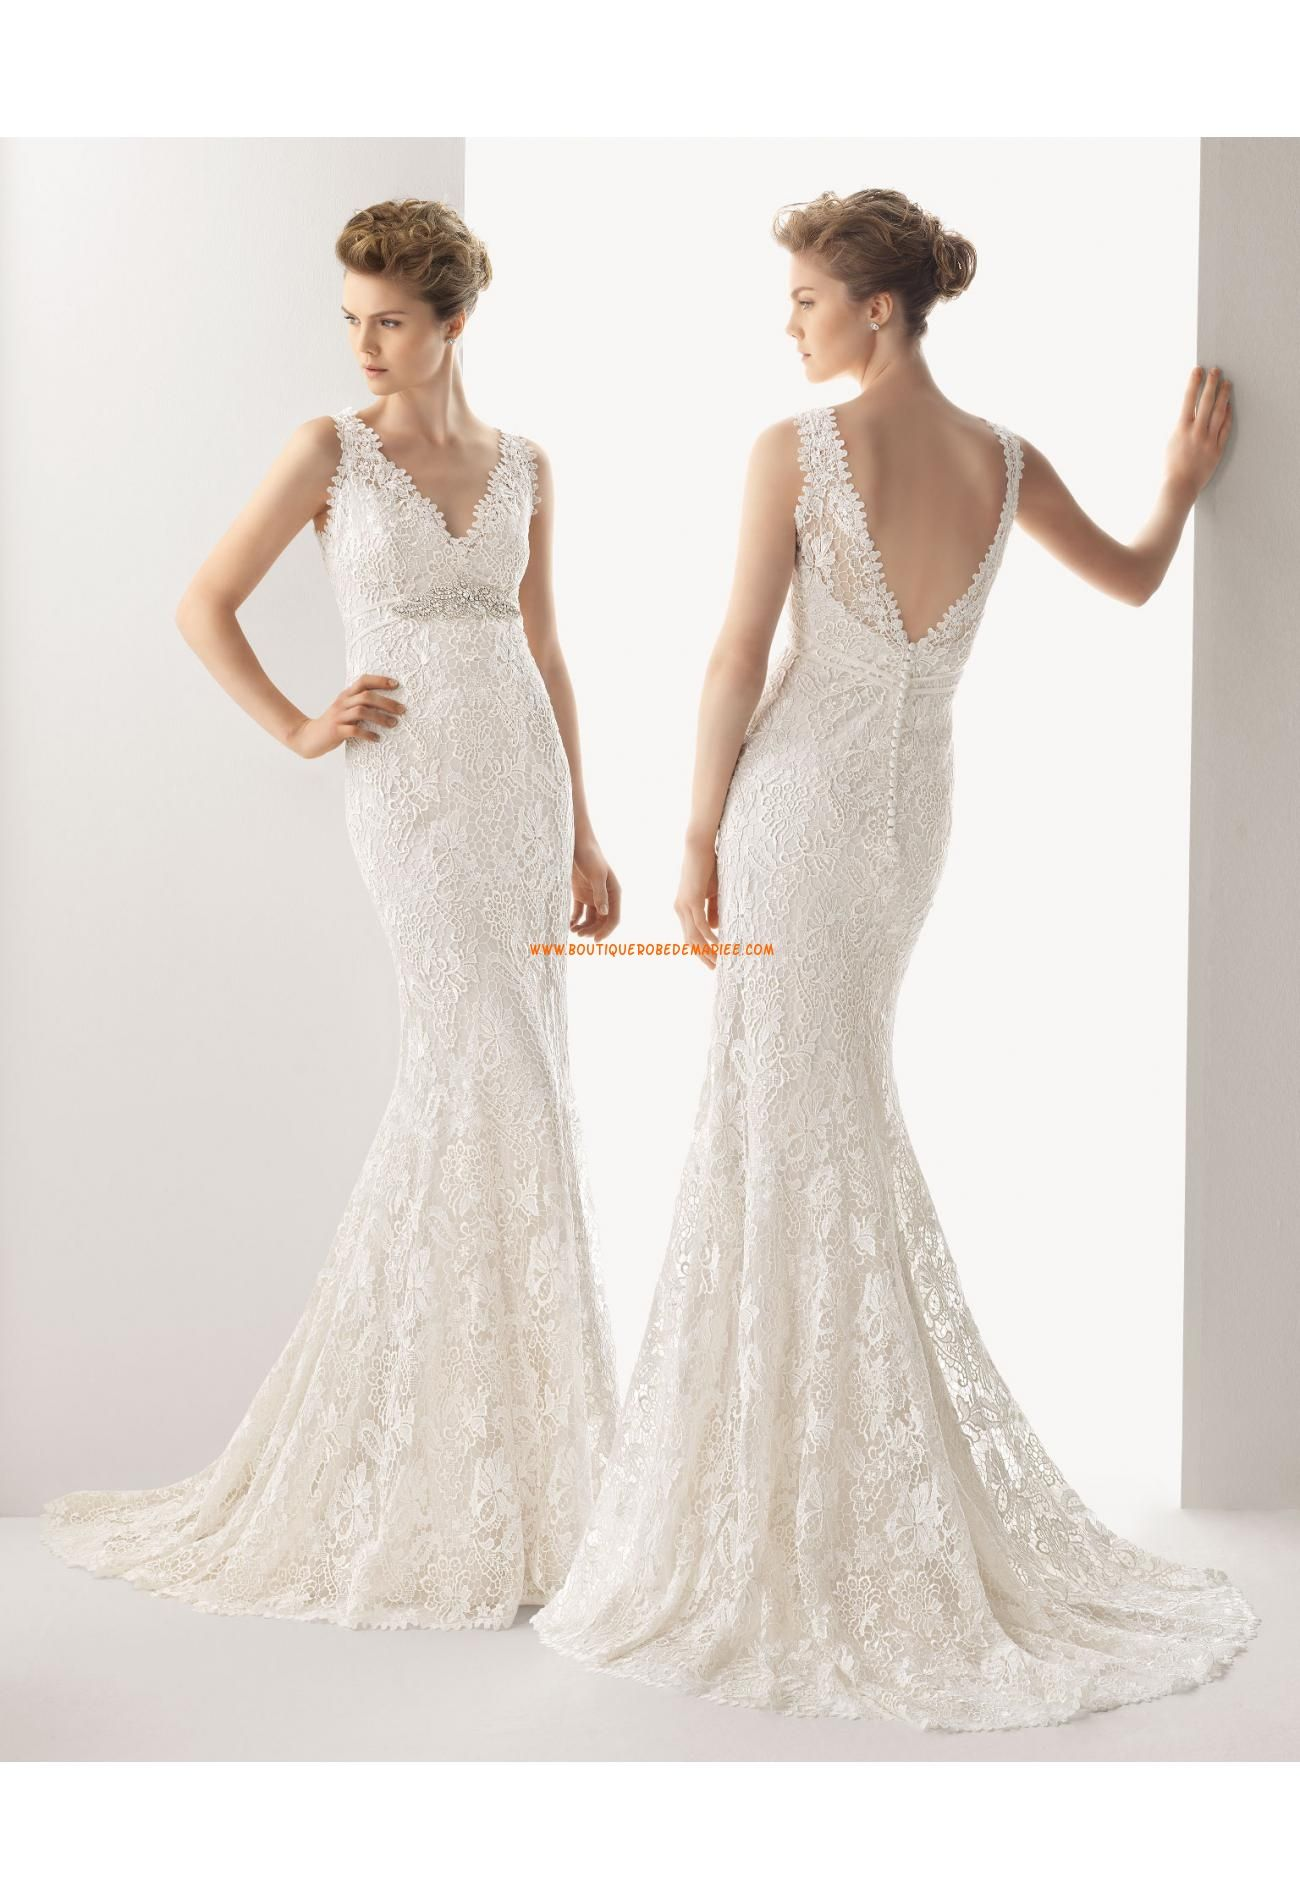 Wedding dress under 500  Robe de marie col V dentelle perles sirne  new bridal gowns